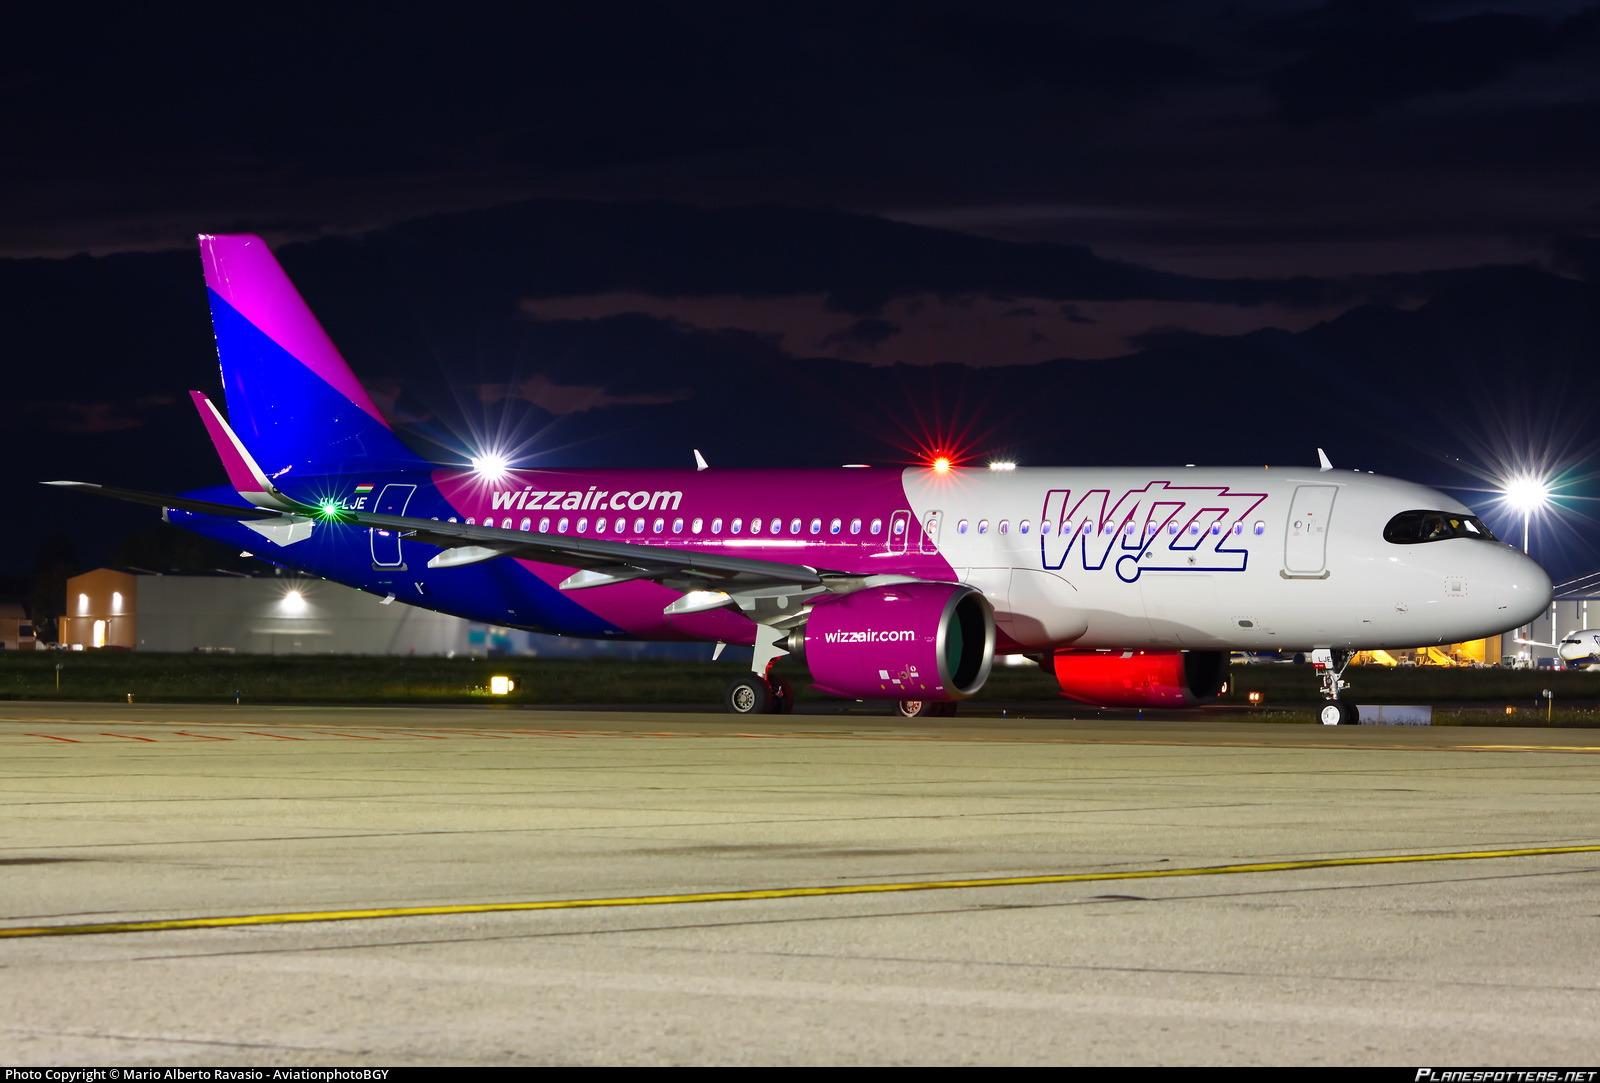 Ha Lje Wizz Air Airbus A320 271n Photo By Mario Alberto Ravasio Aviationphotobgy Id 1097591 Planespotters Net